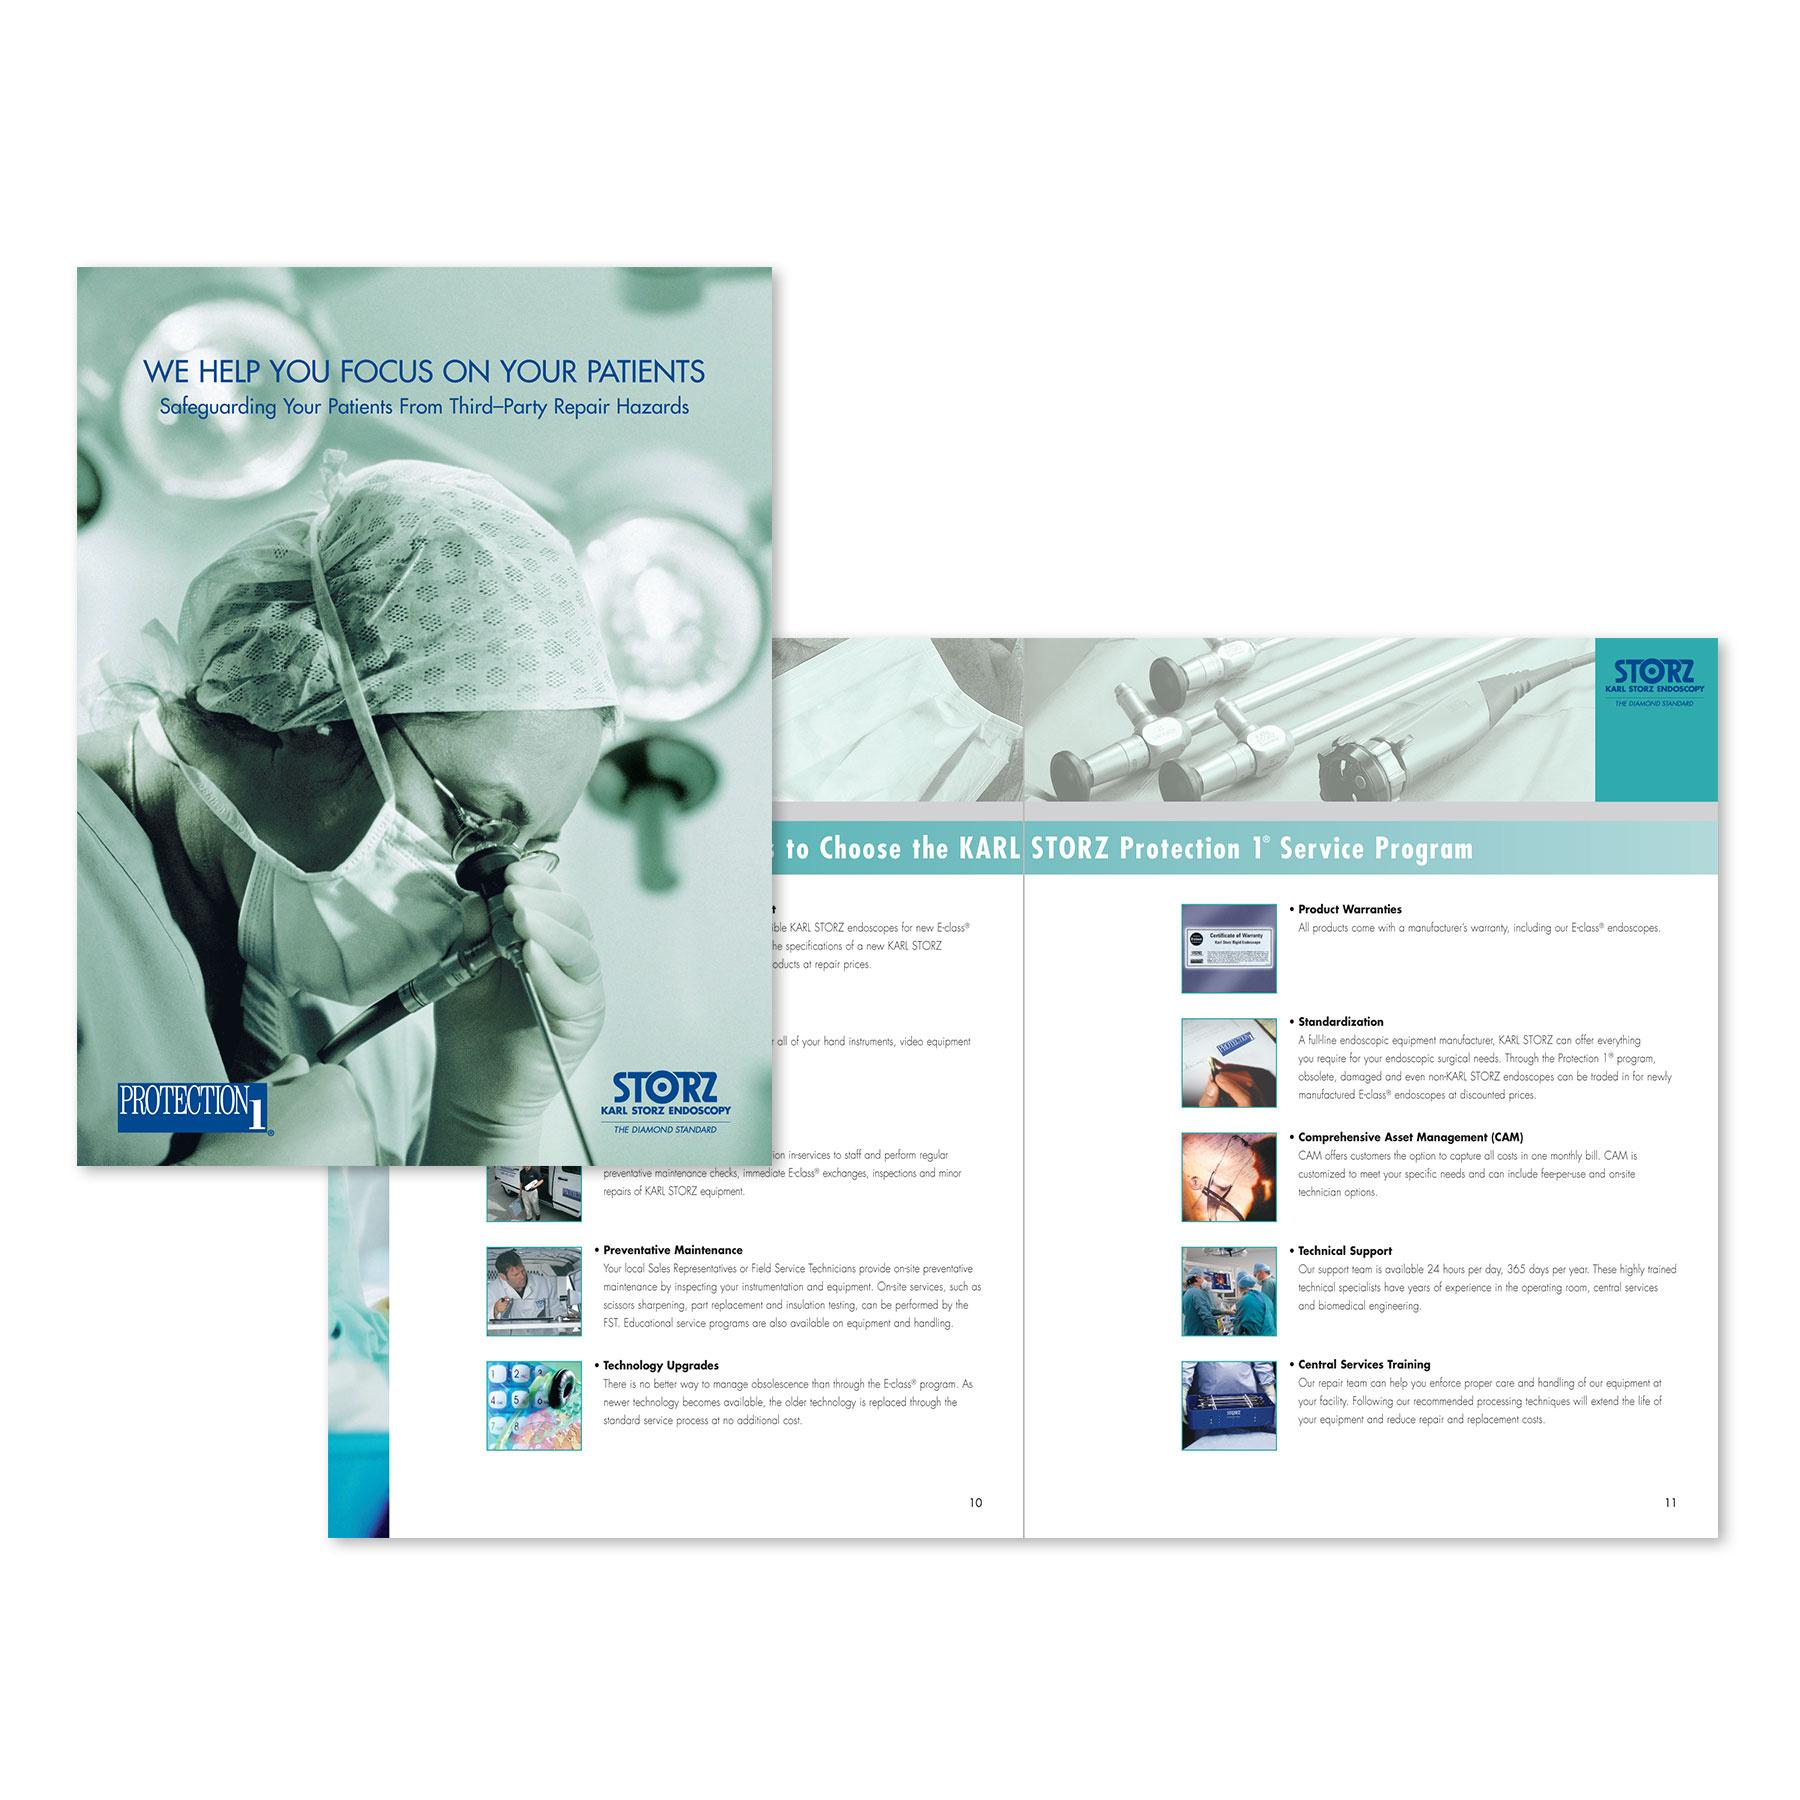 Karl Storz Protection 1 Brochure